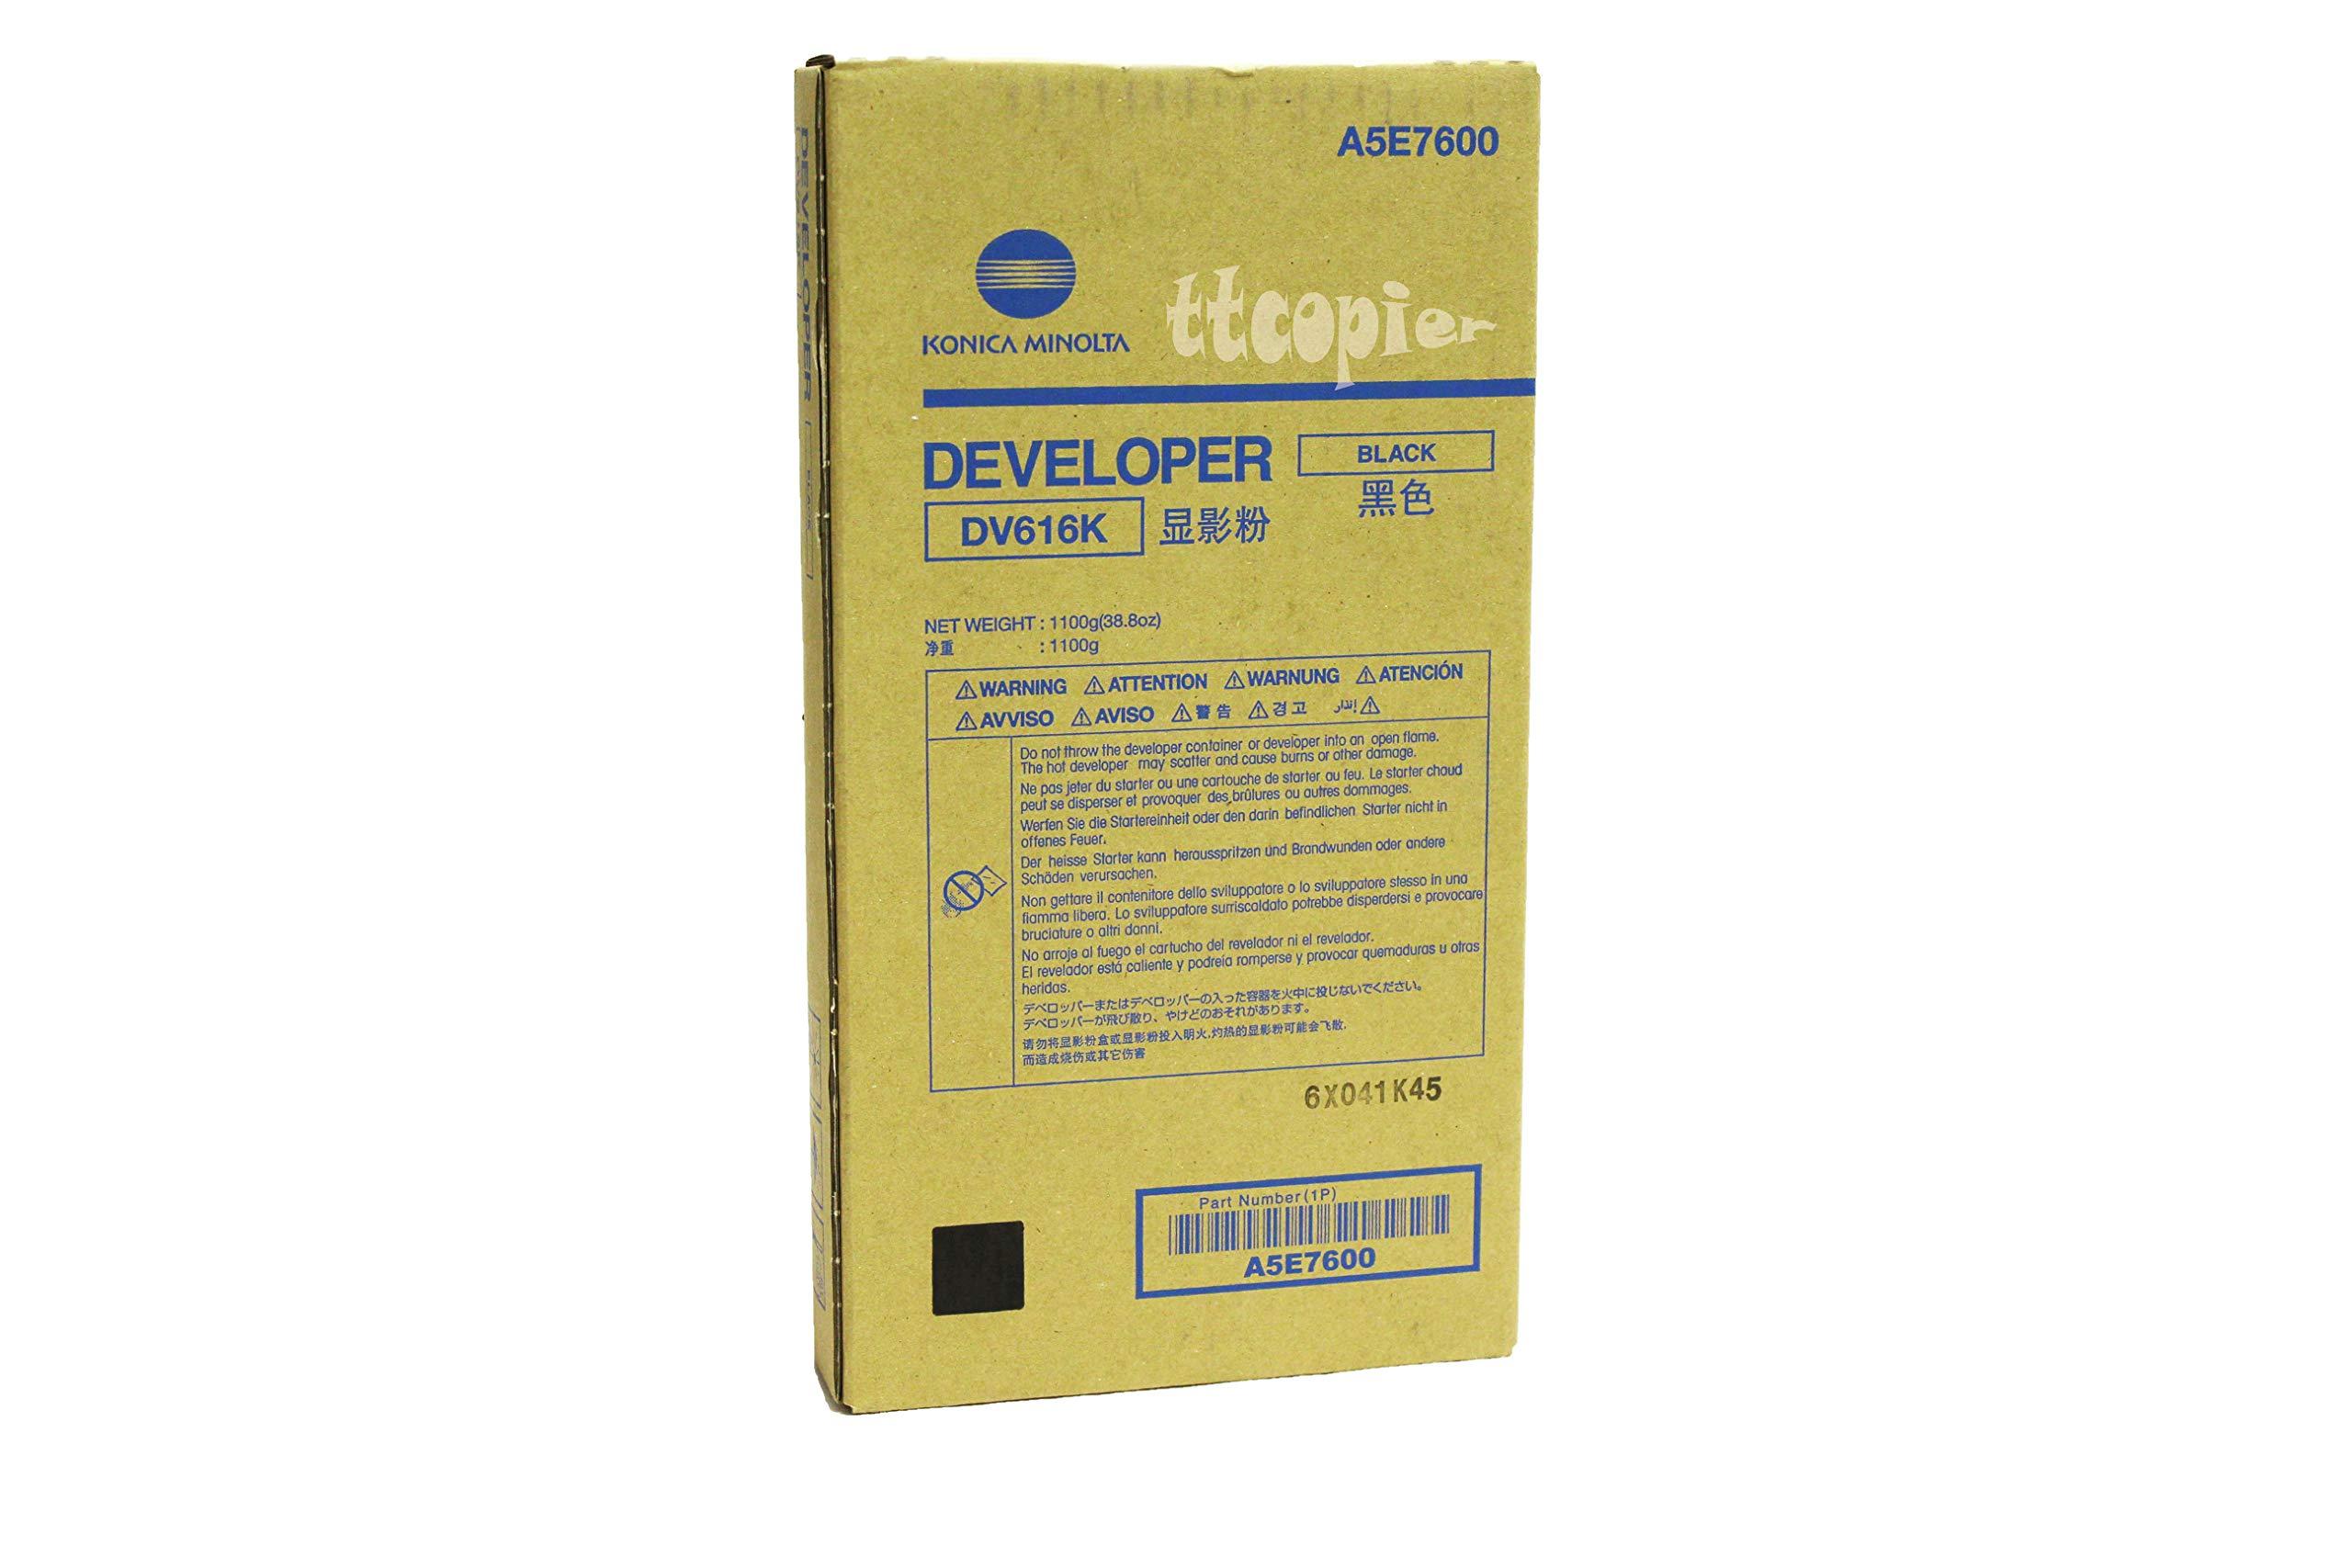 Genuine Konica Minolta A5E7600 DV616K Black Developer for C1100 C1085